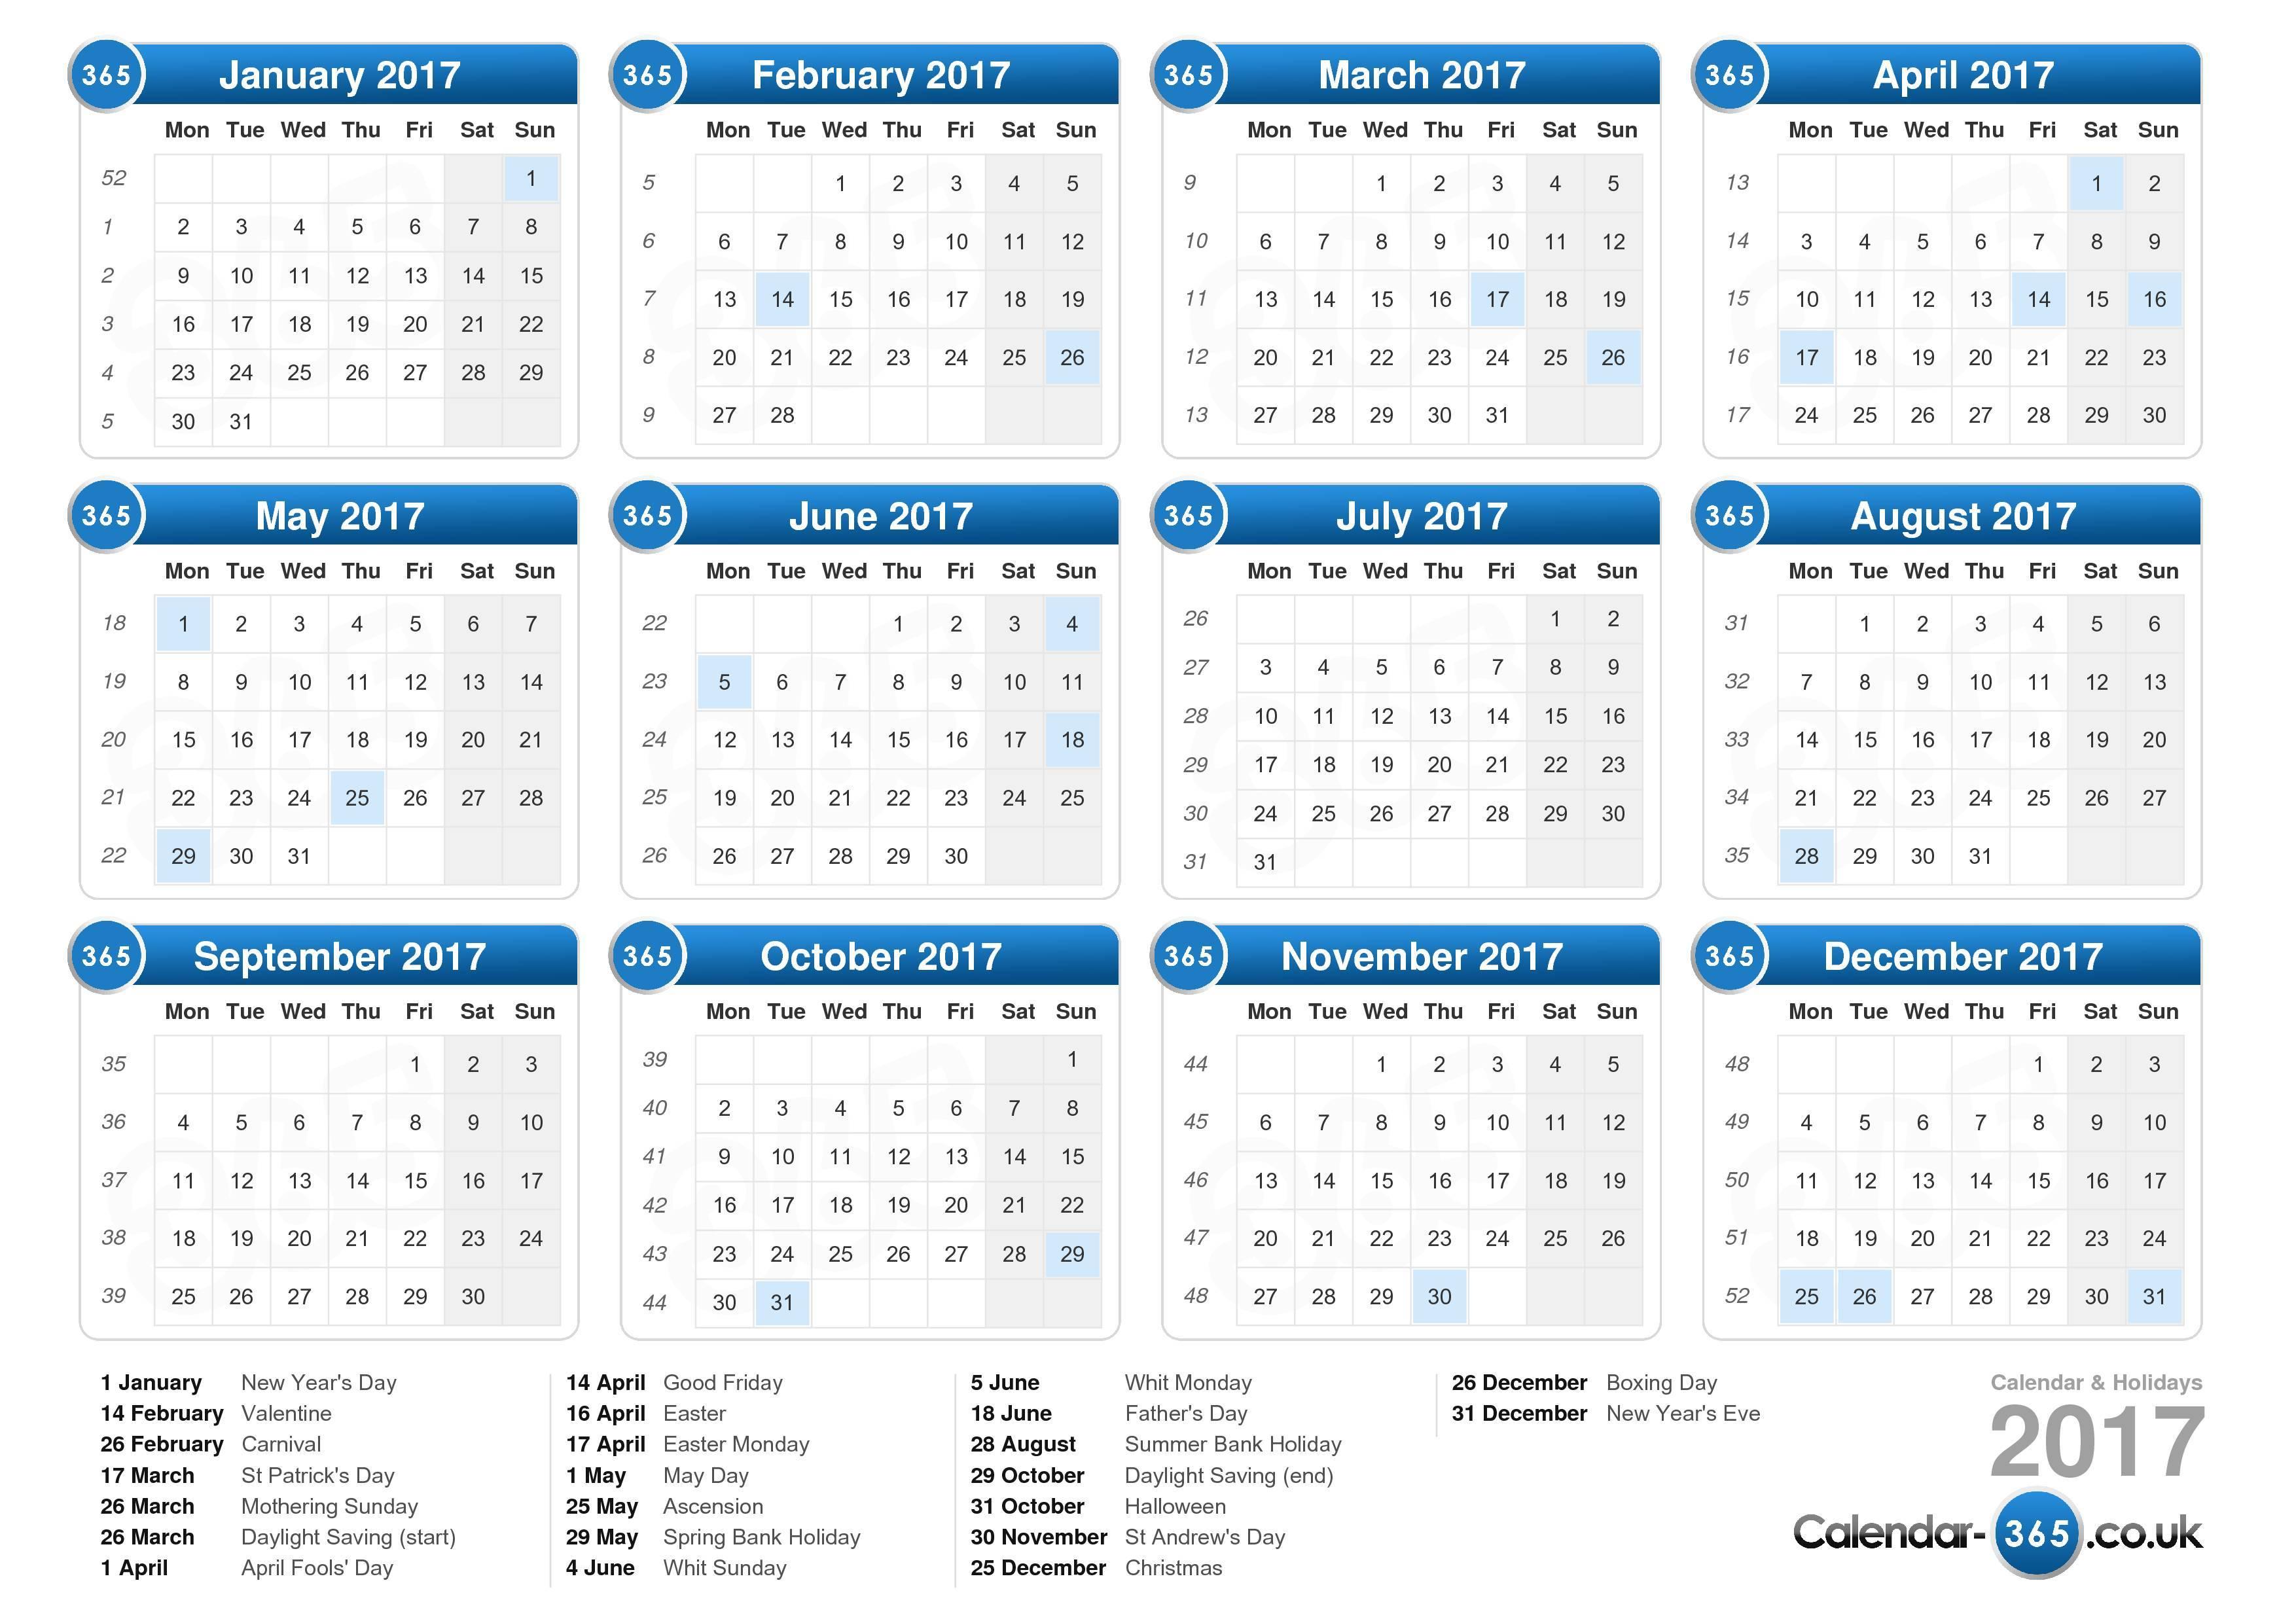 UK Online Calendar 2017